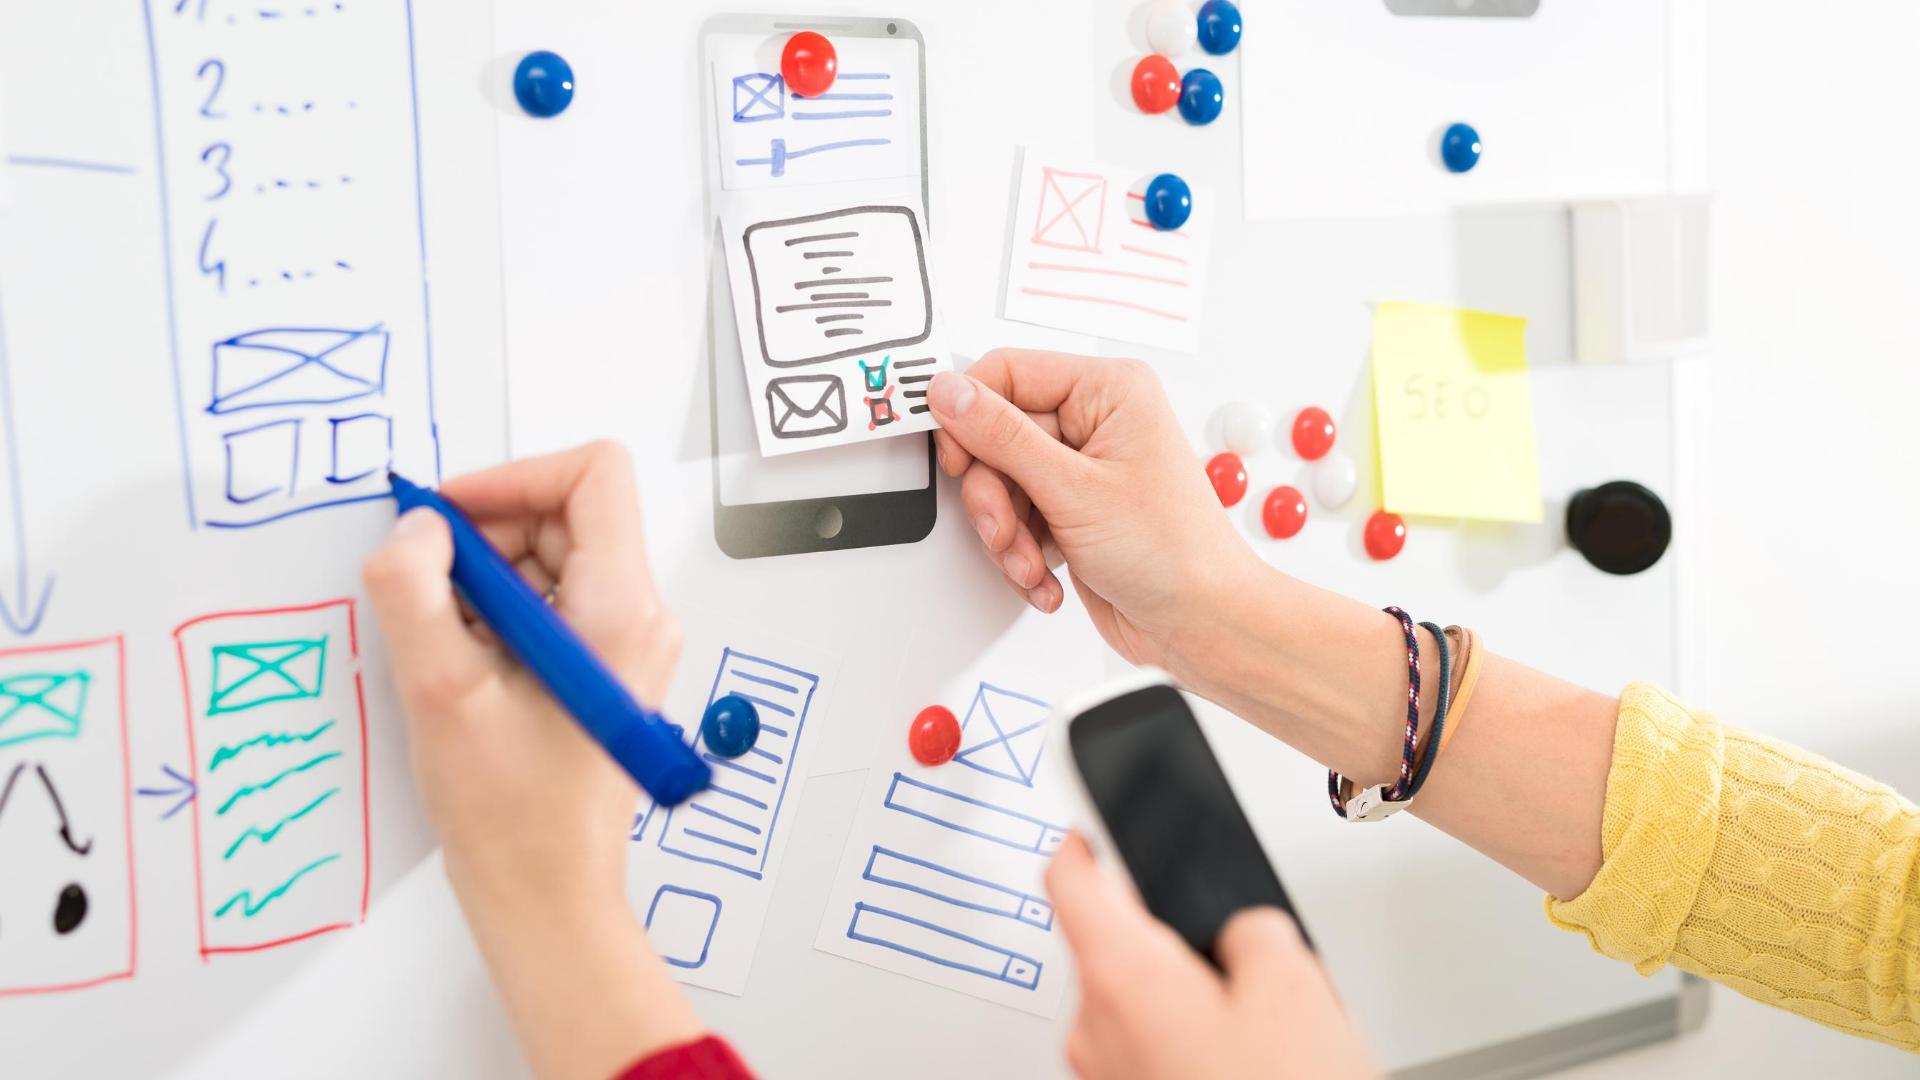 iSmart Communications Content Marketing Creation Brainstorm